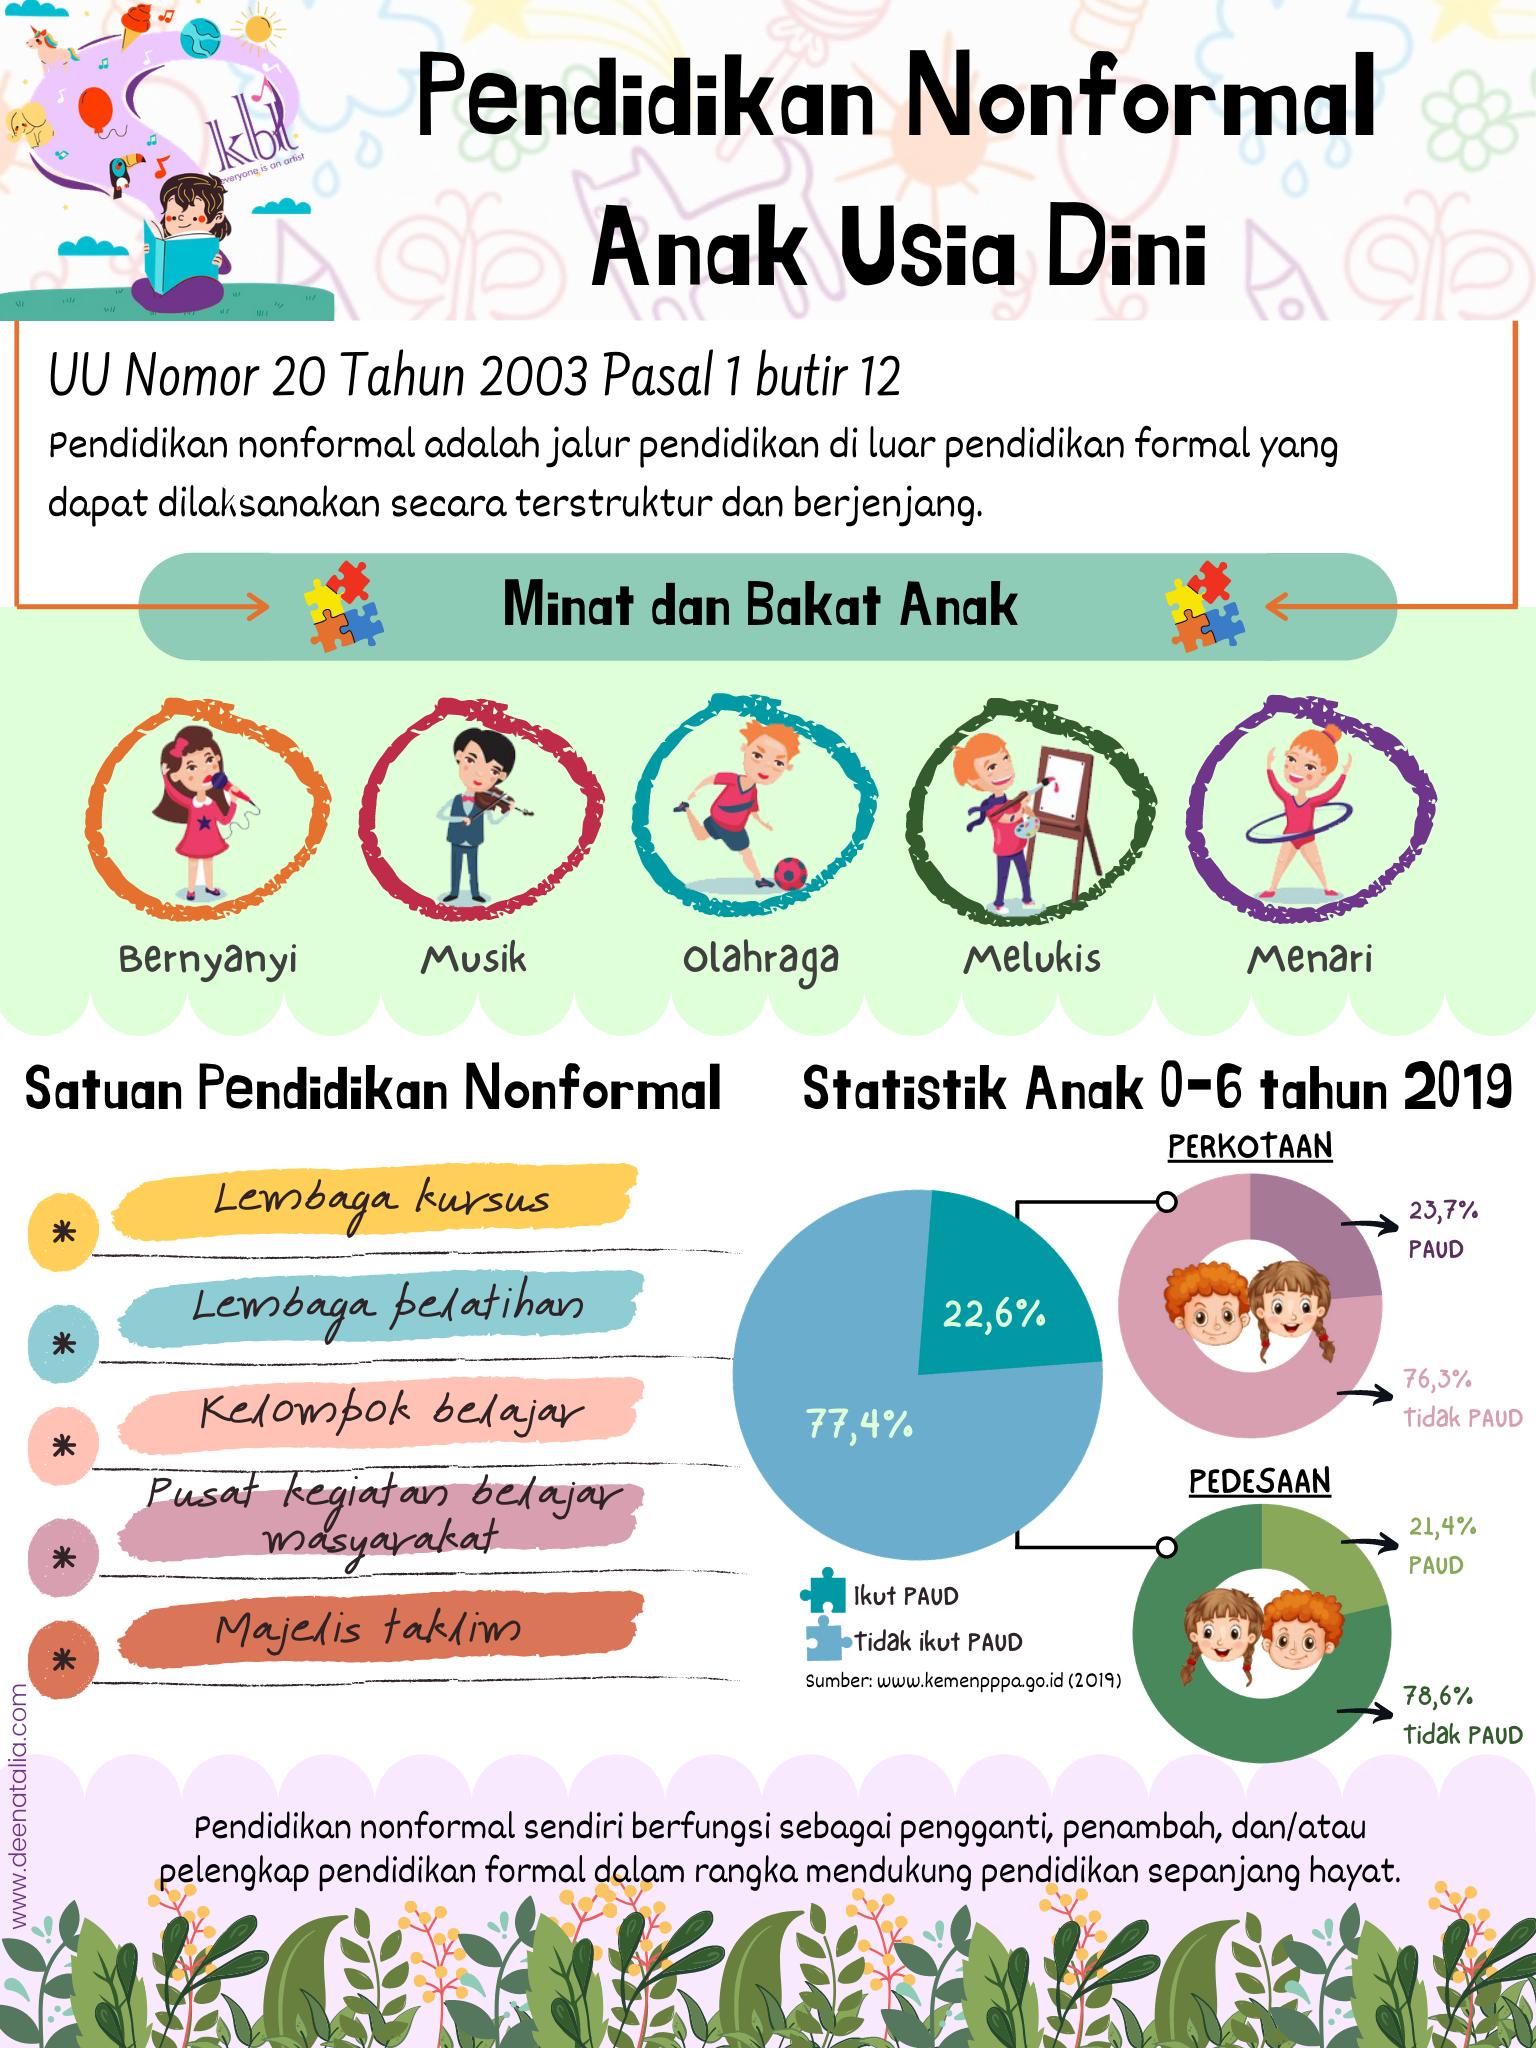 Pendidikan nonformal anak usia dini